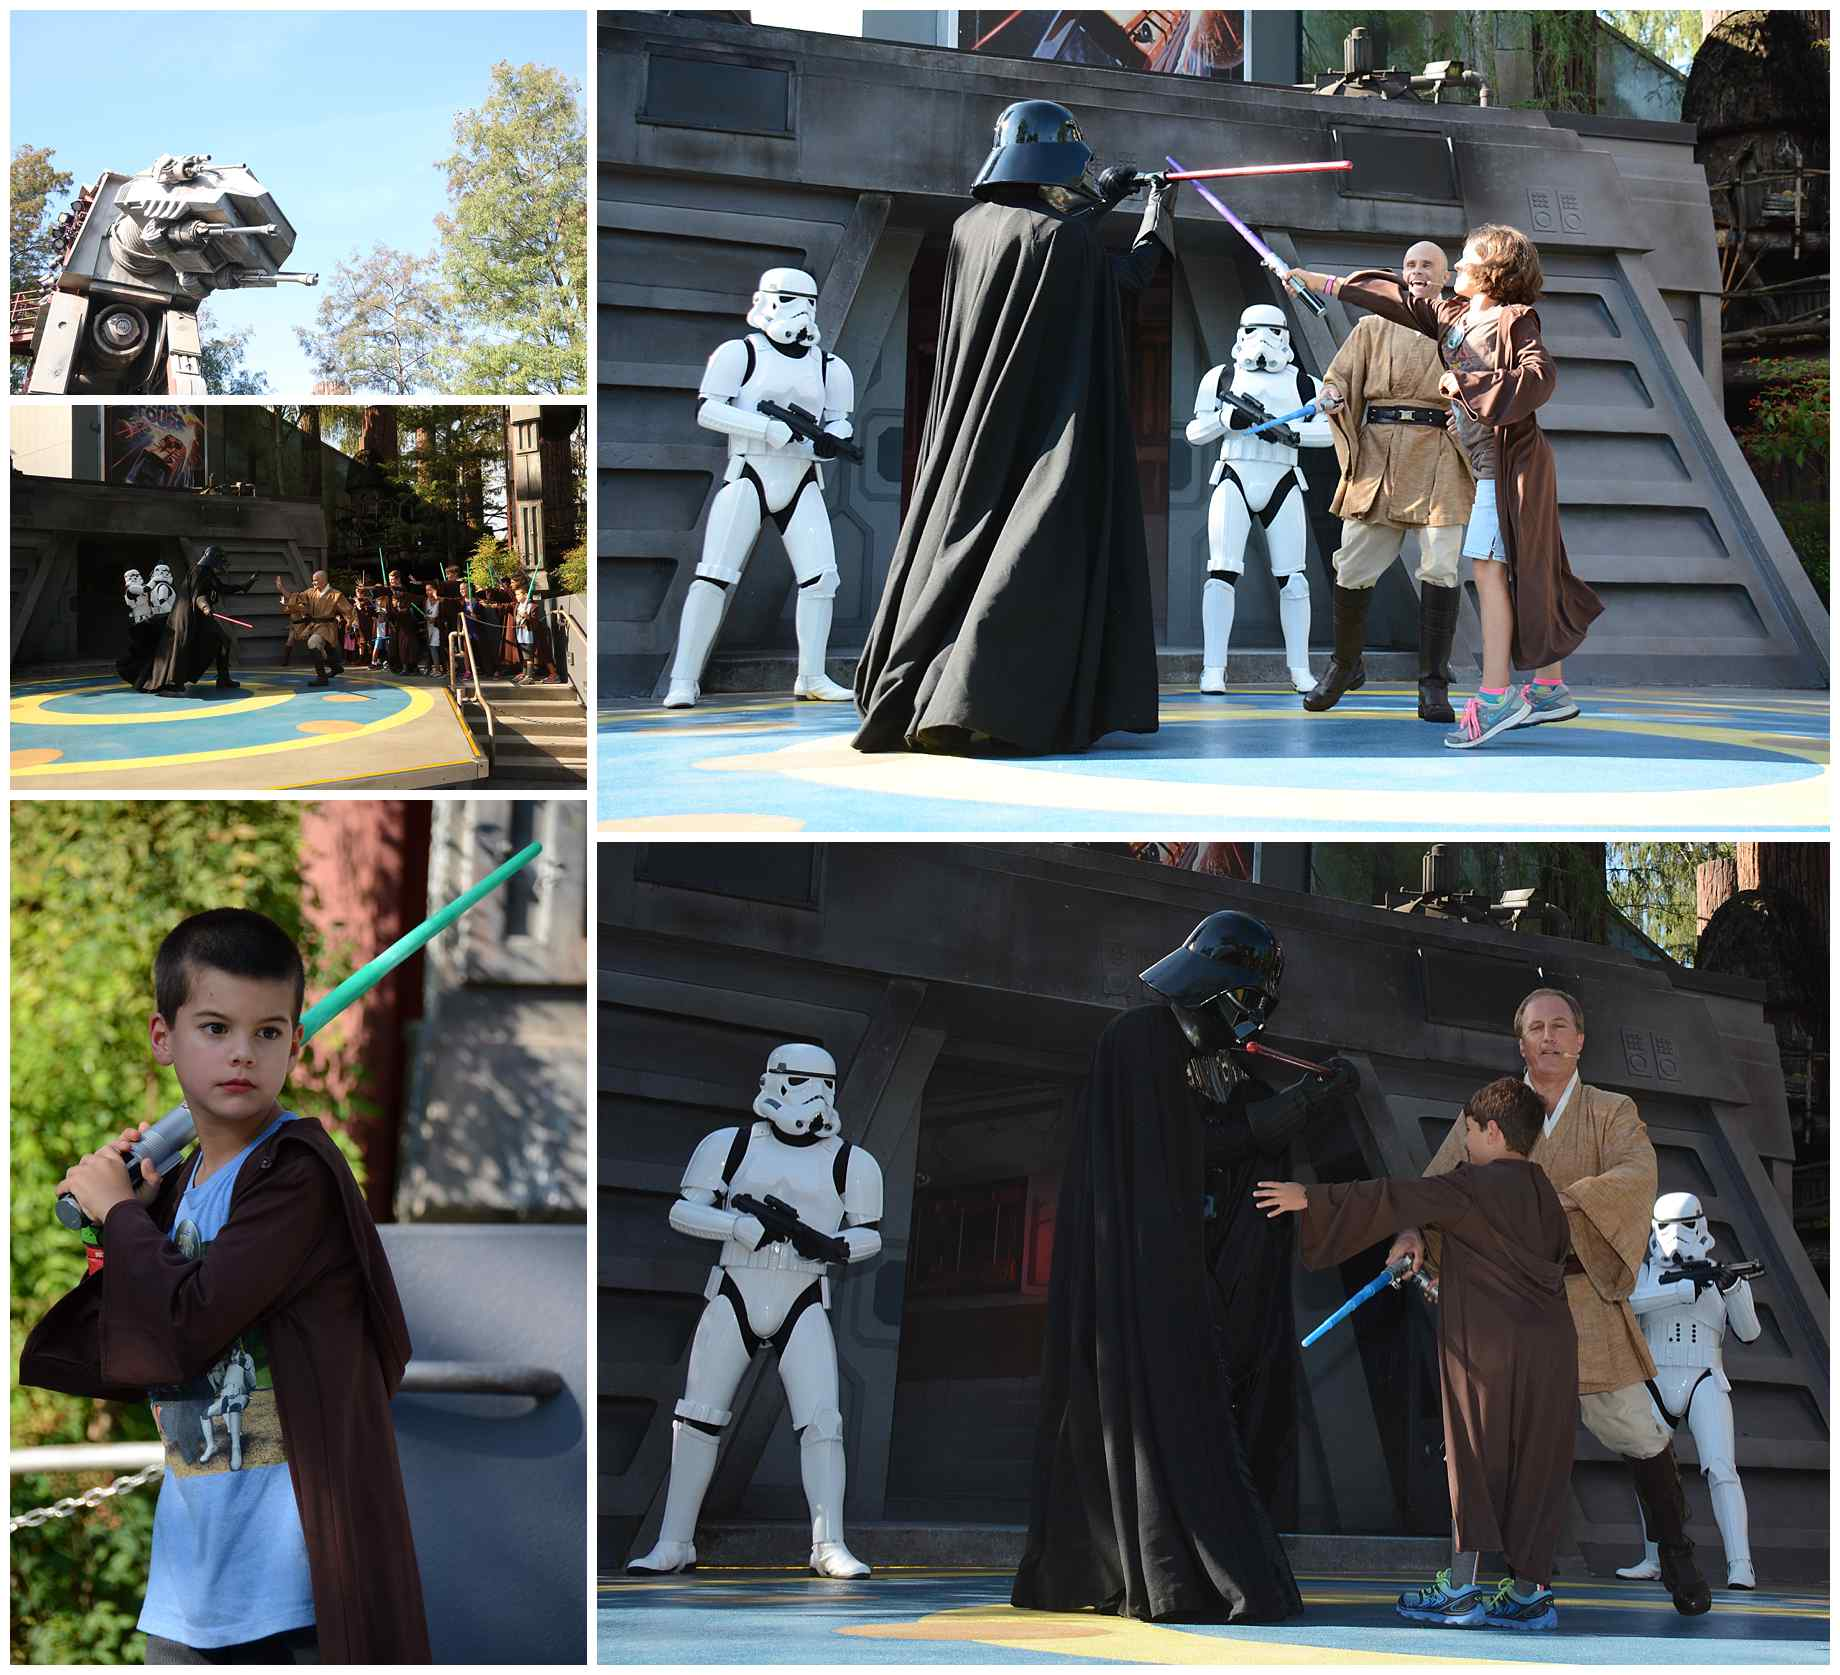 Disney-World-2015-004